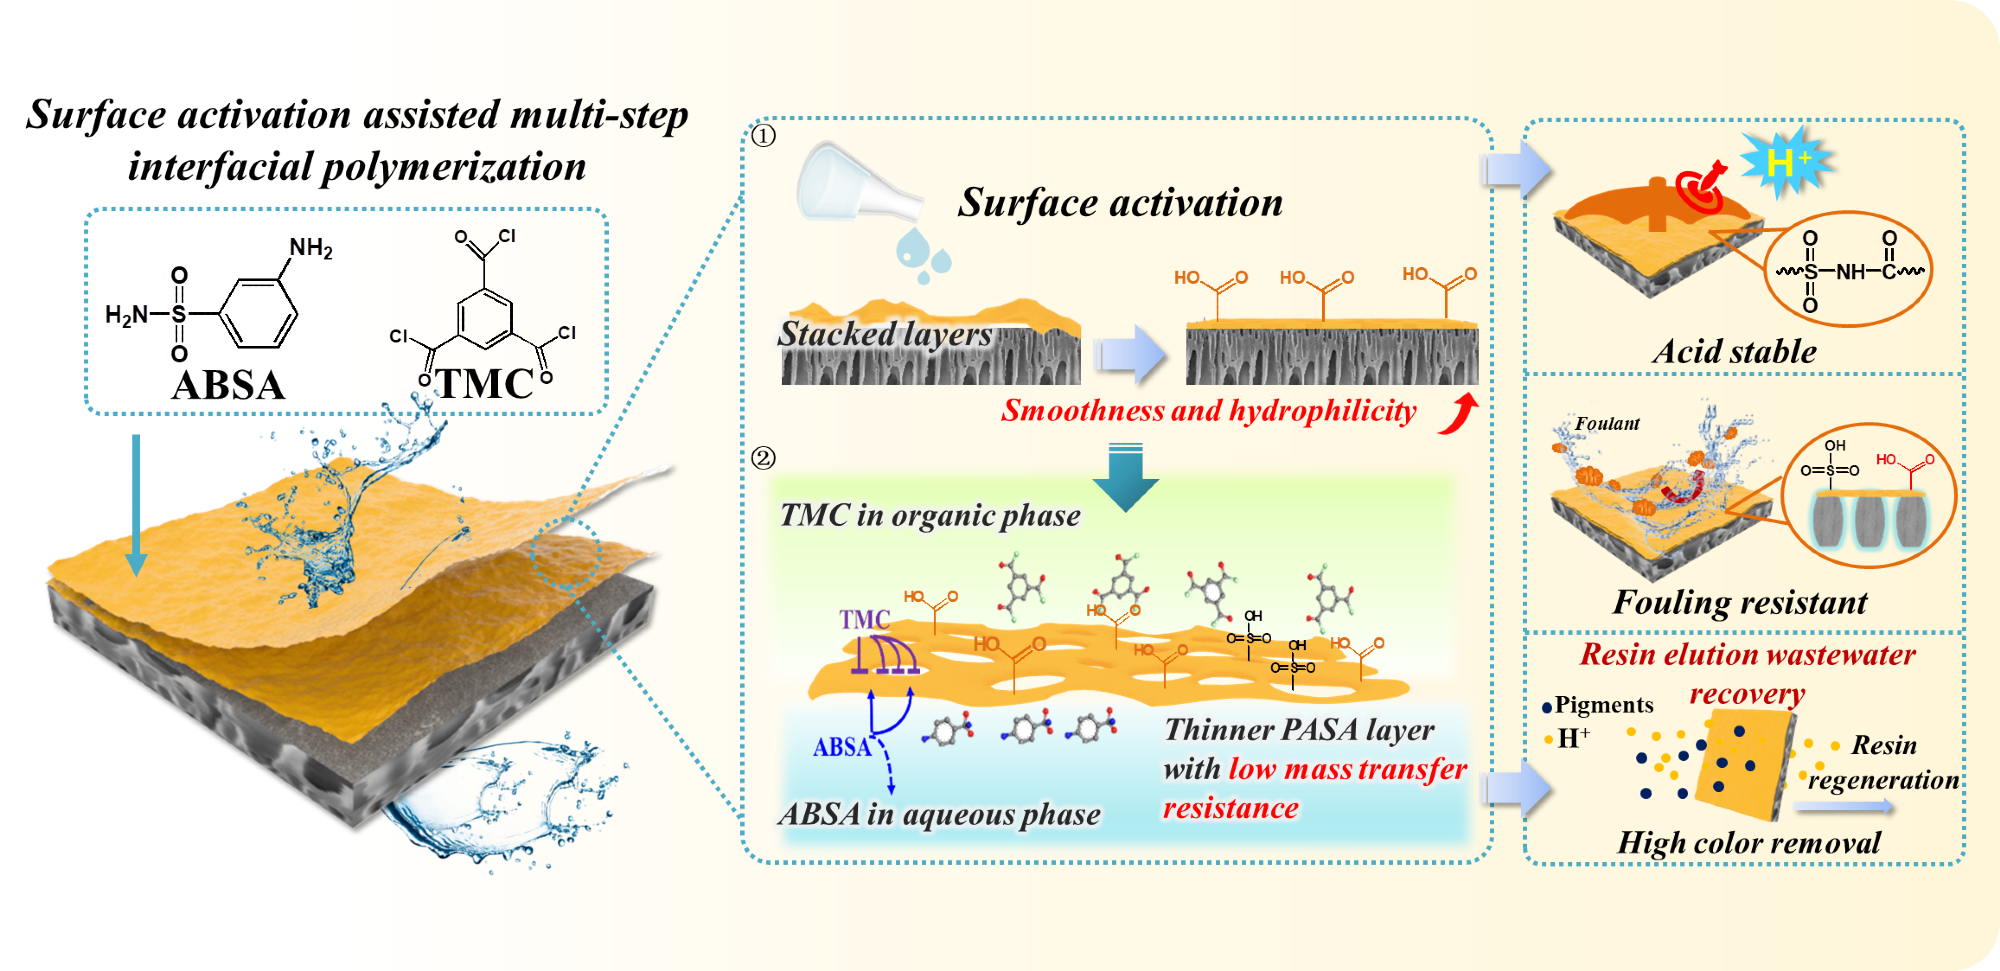 Novel Acid-Resistant Nanofiltration Membranes for Efficient Wastewater Treatment.